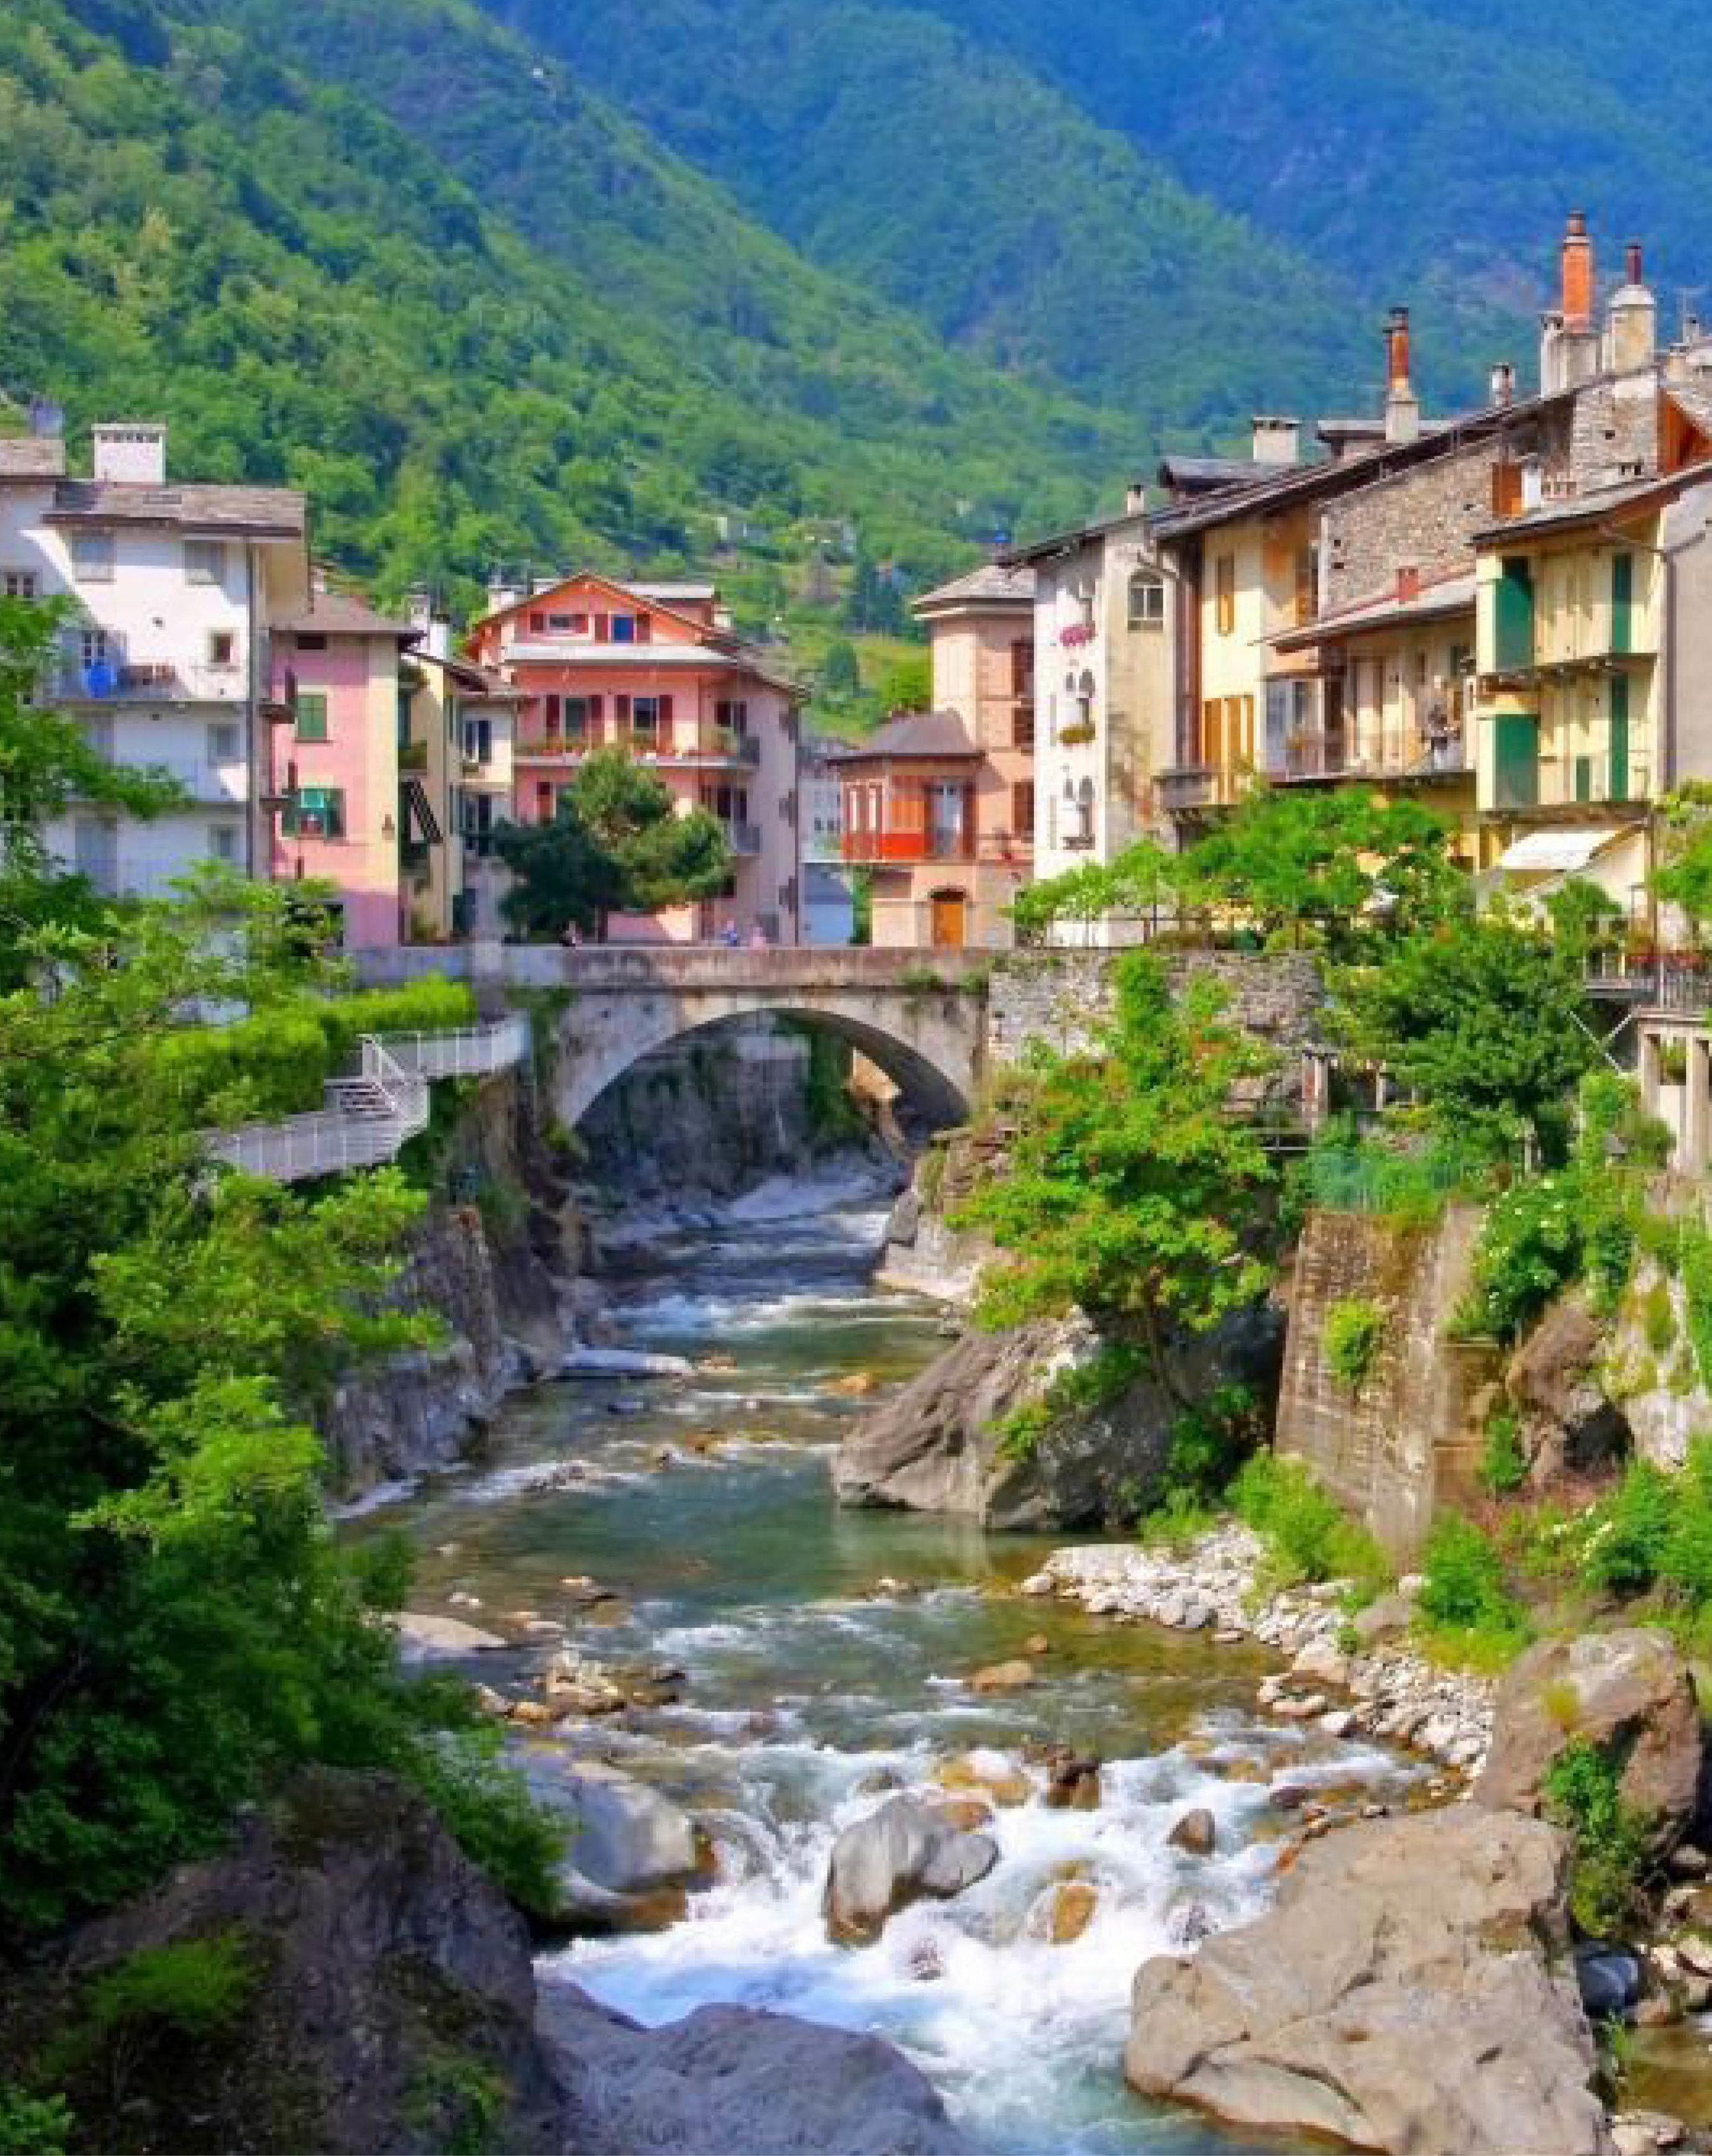 OSTERIA_EDM_Lombardia Region1.jpg